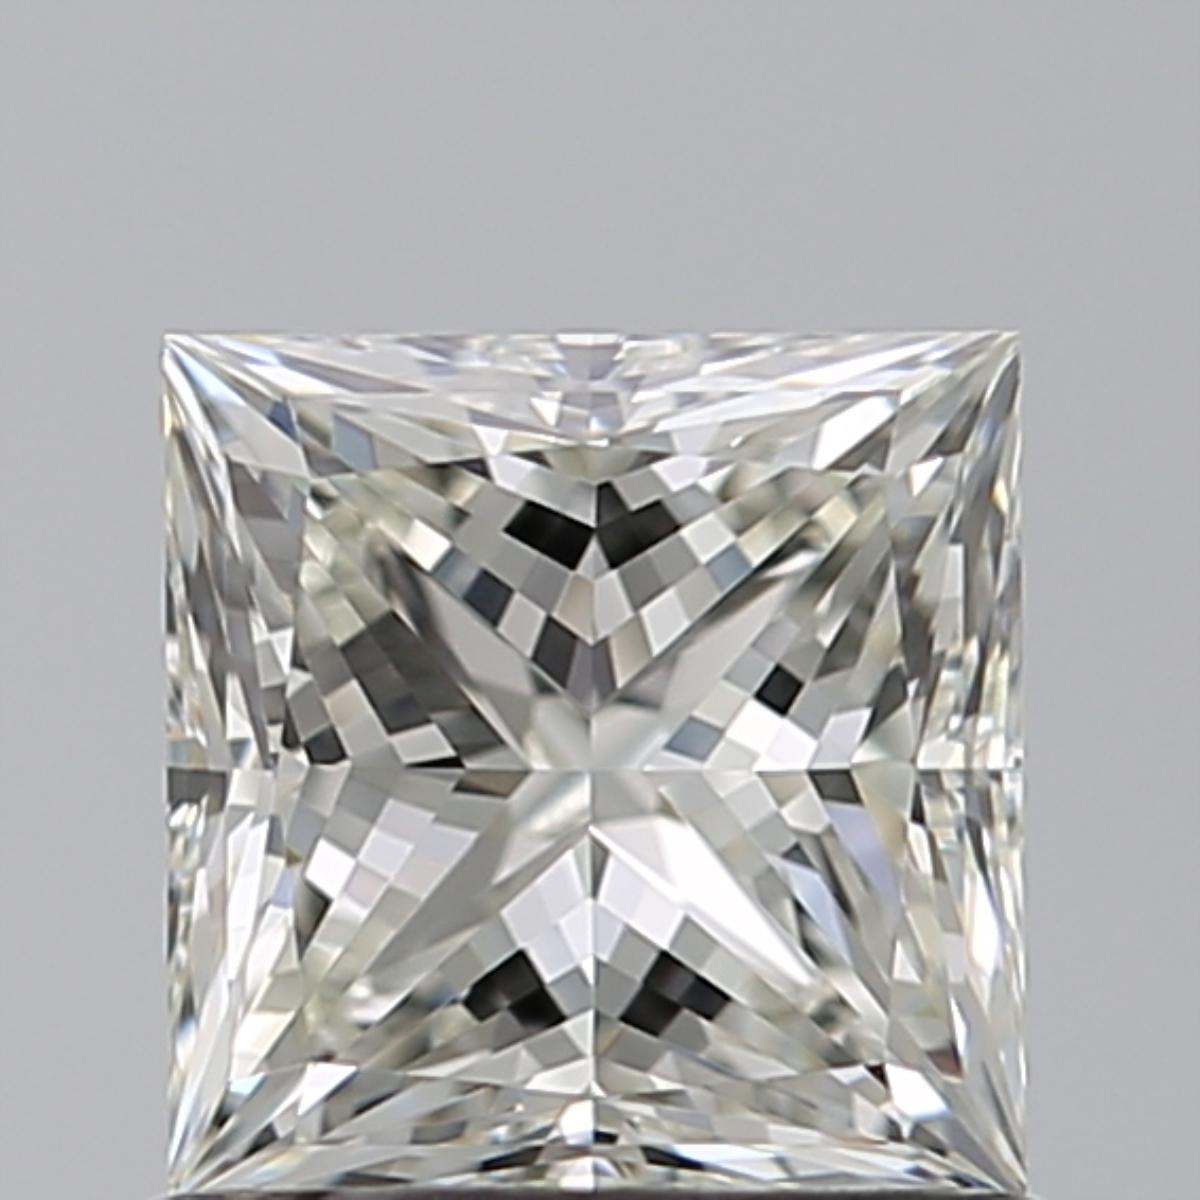 0.91 ct Princess Cut Diamond : J / VS1